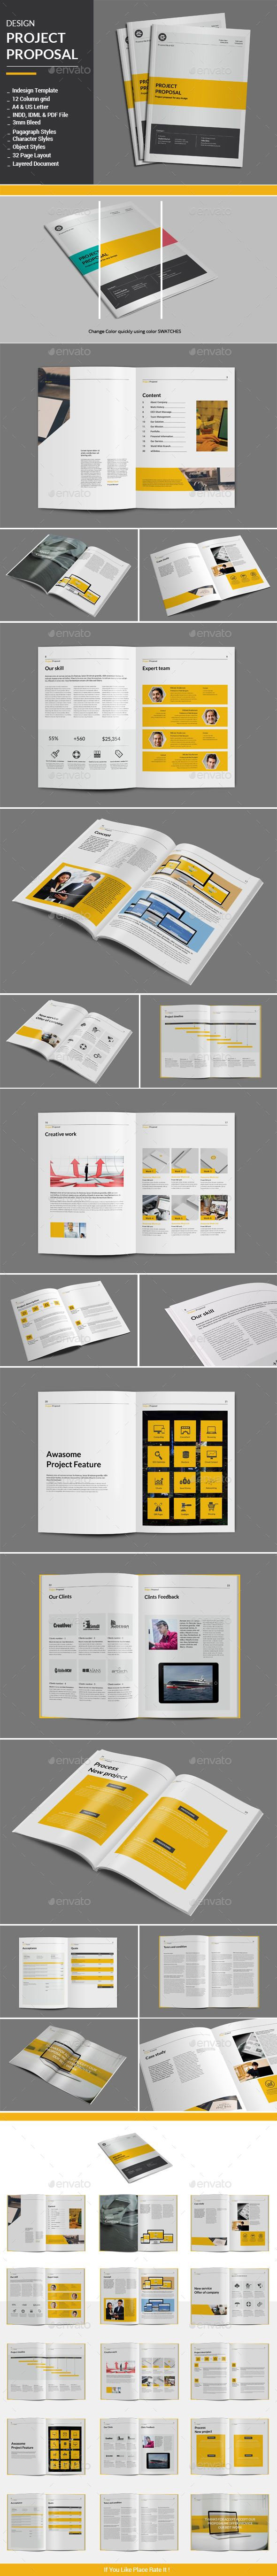 Design Project Proposal Template #design Download: http://graphicriver.net/item/design-project-proposal-template/13093160?ref=ksioks